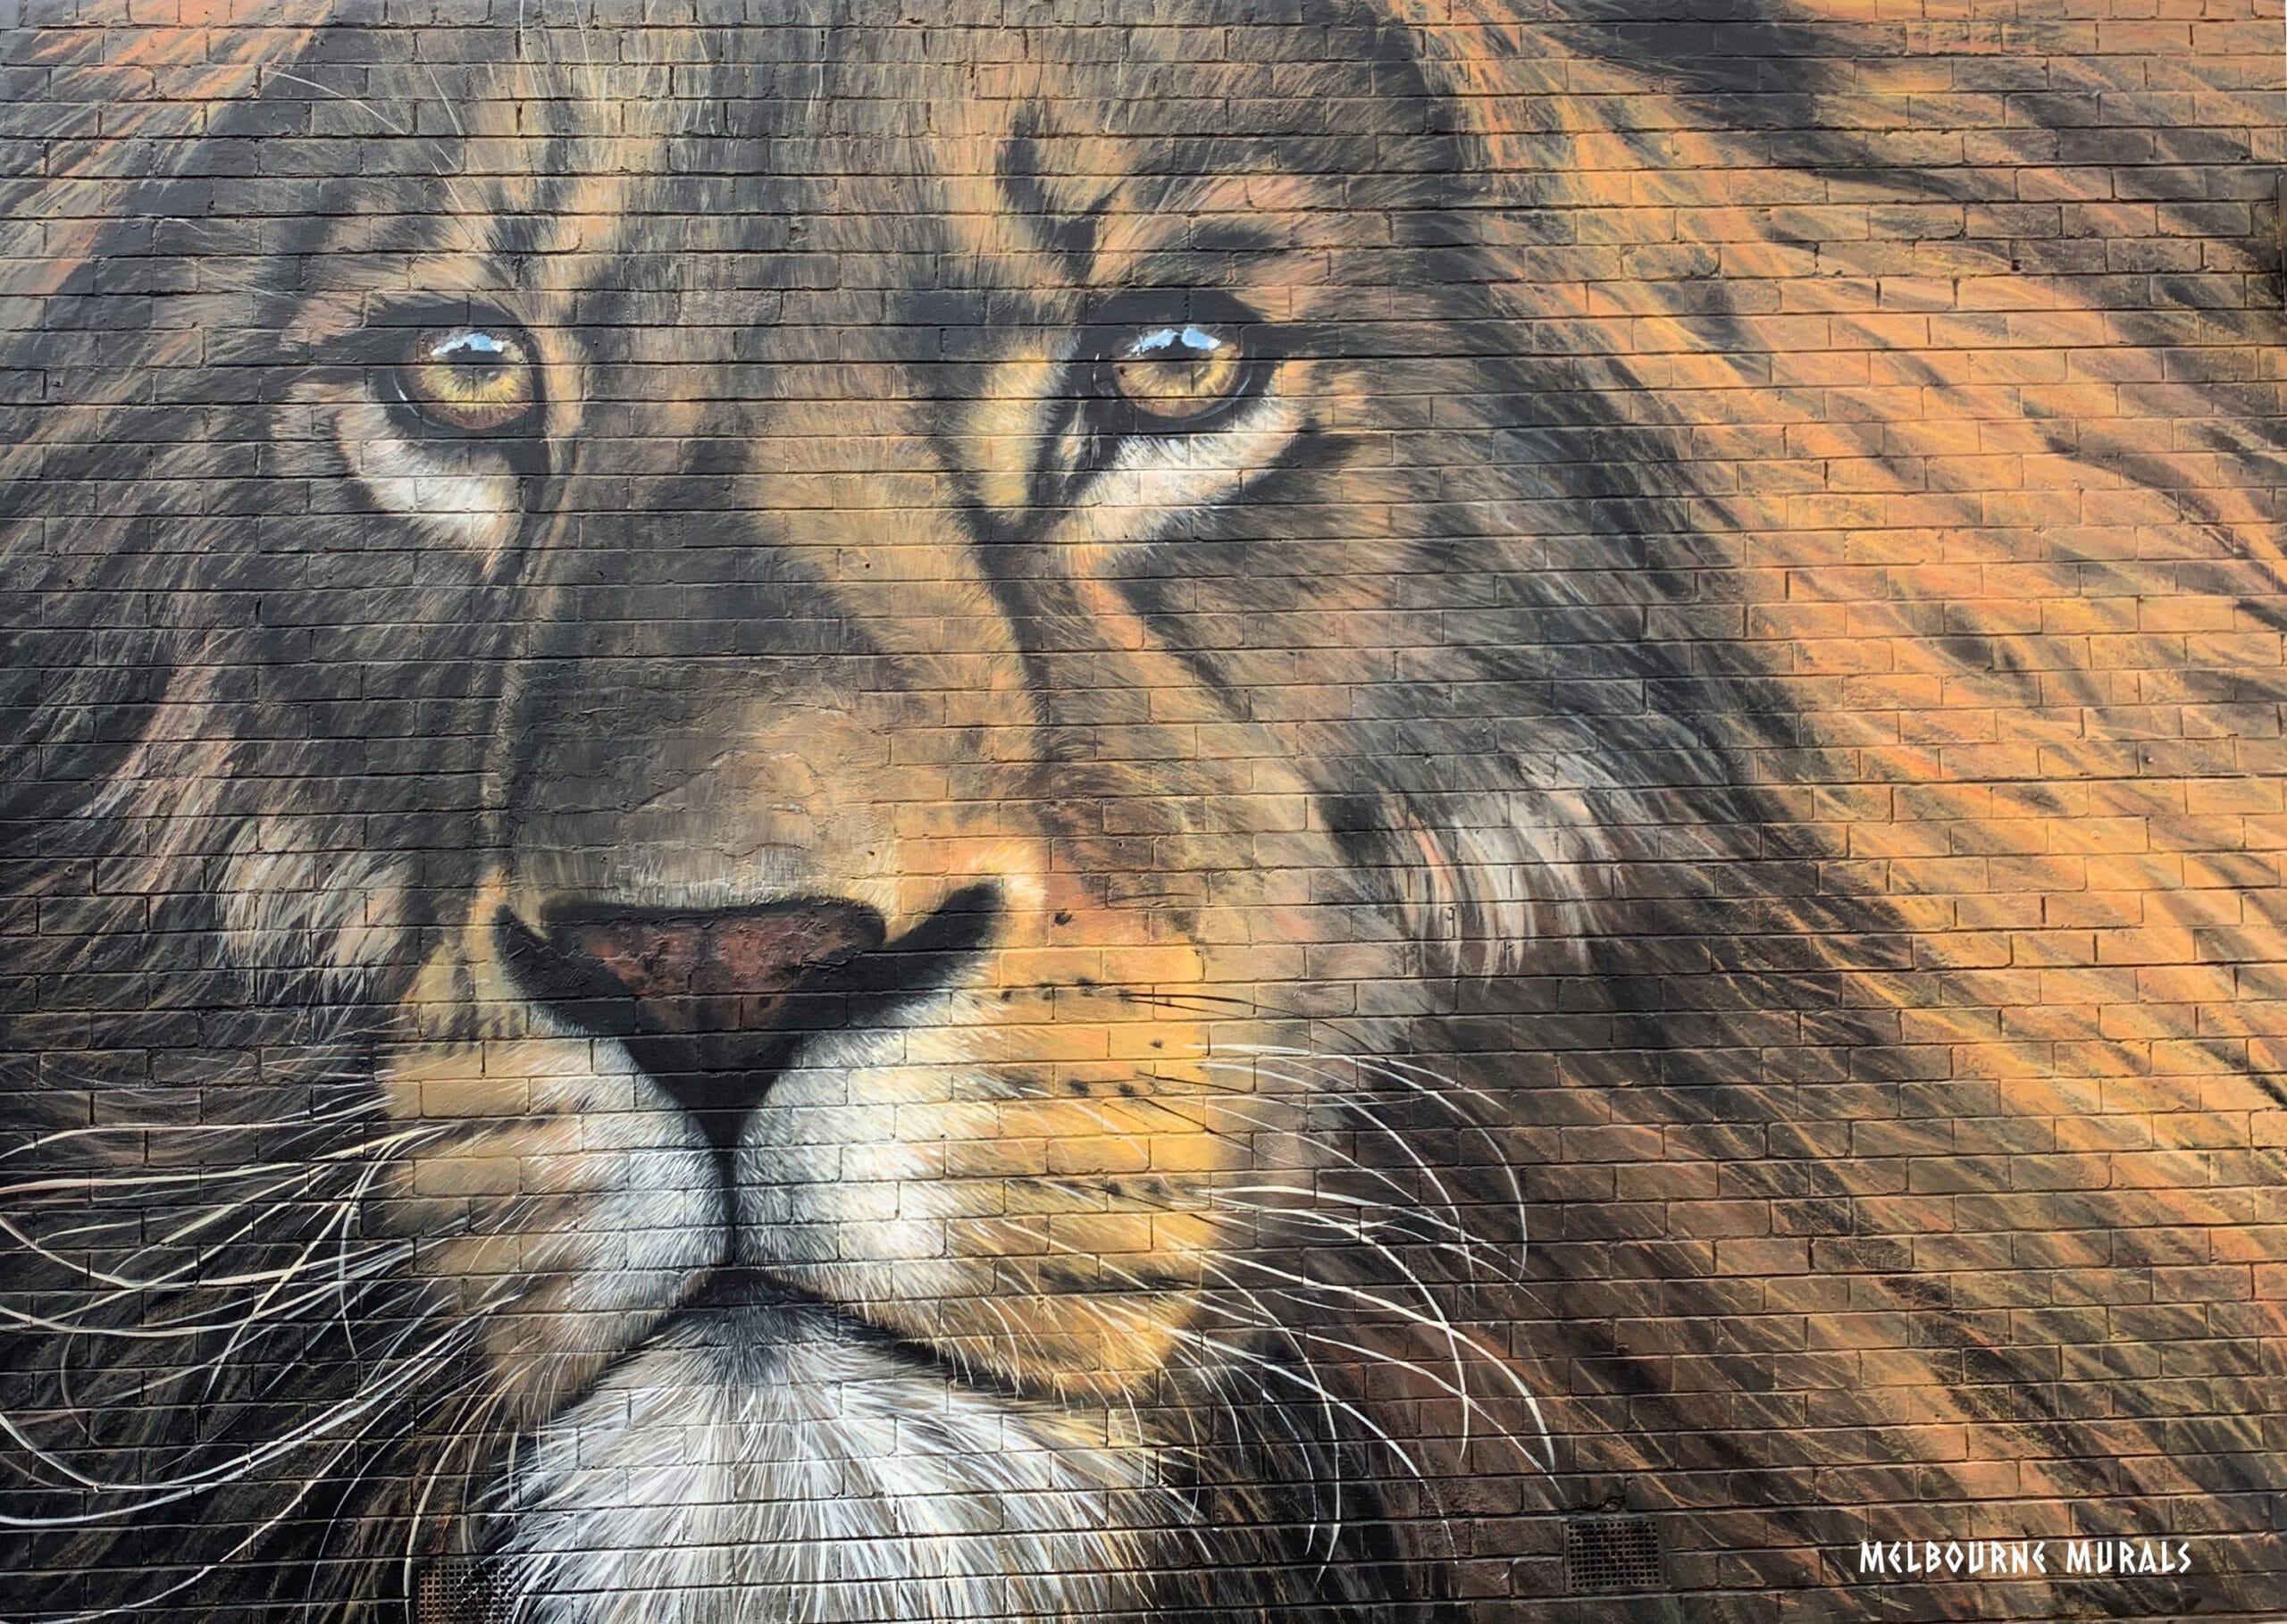 @melbournesmurals - Fearless Lion